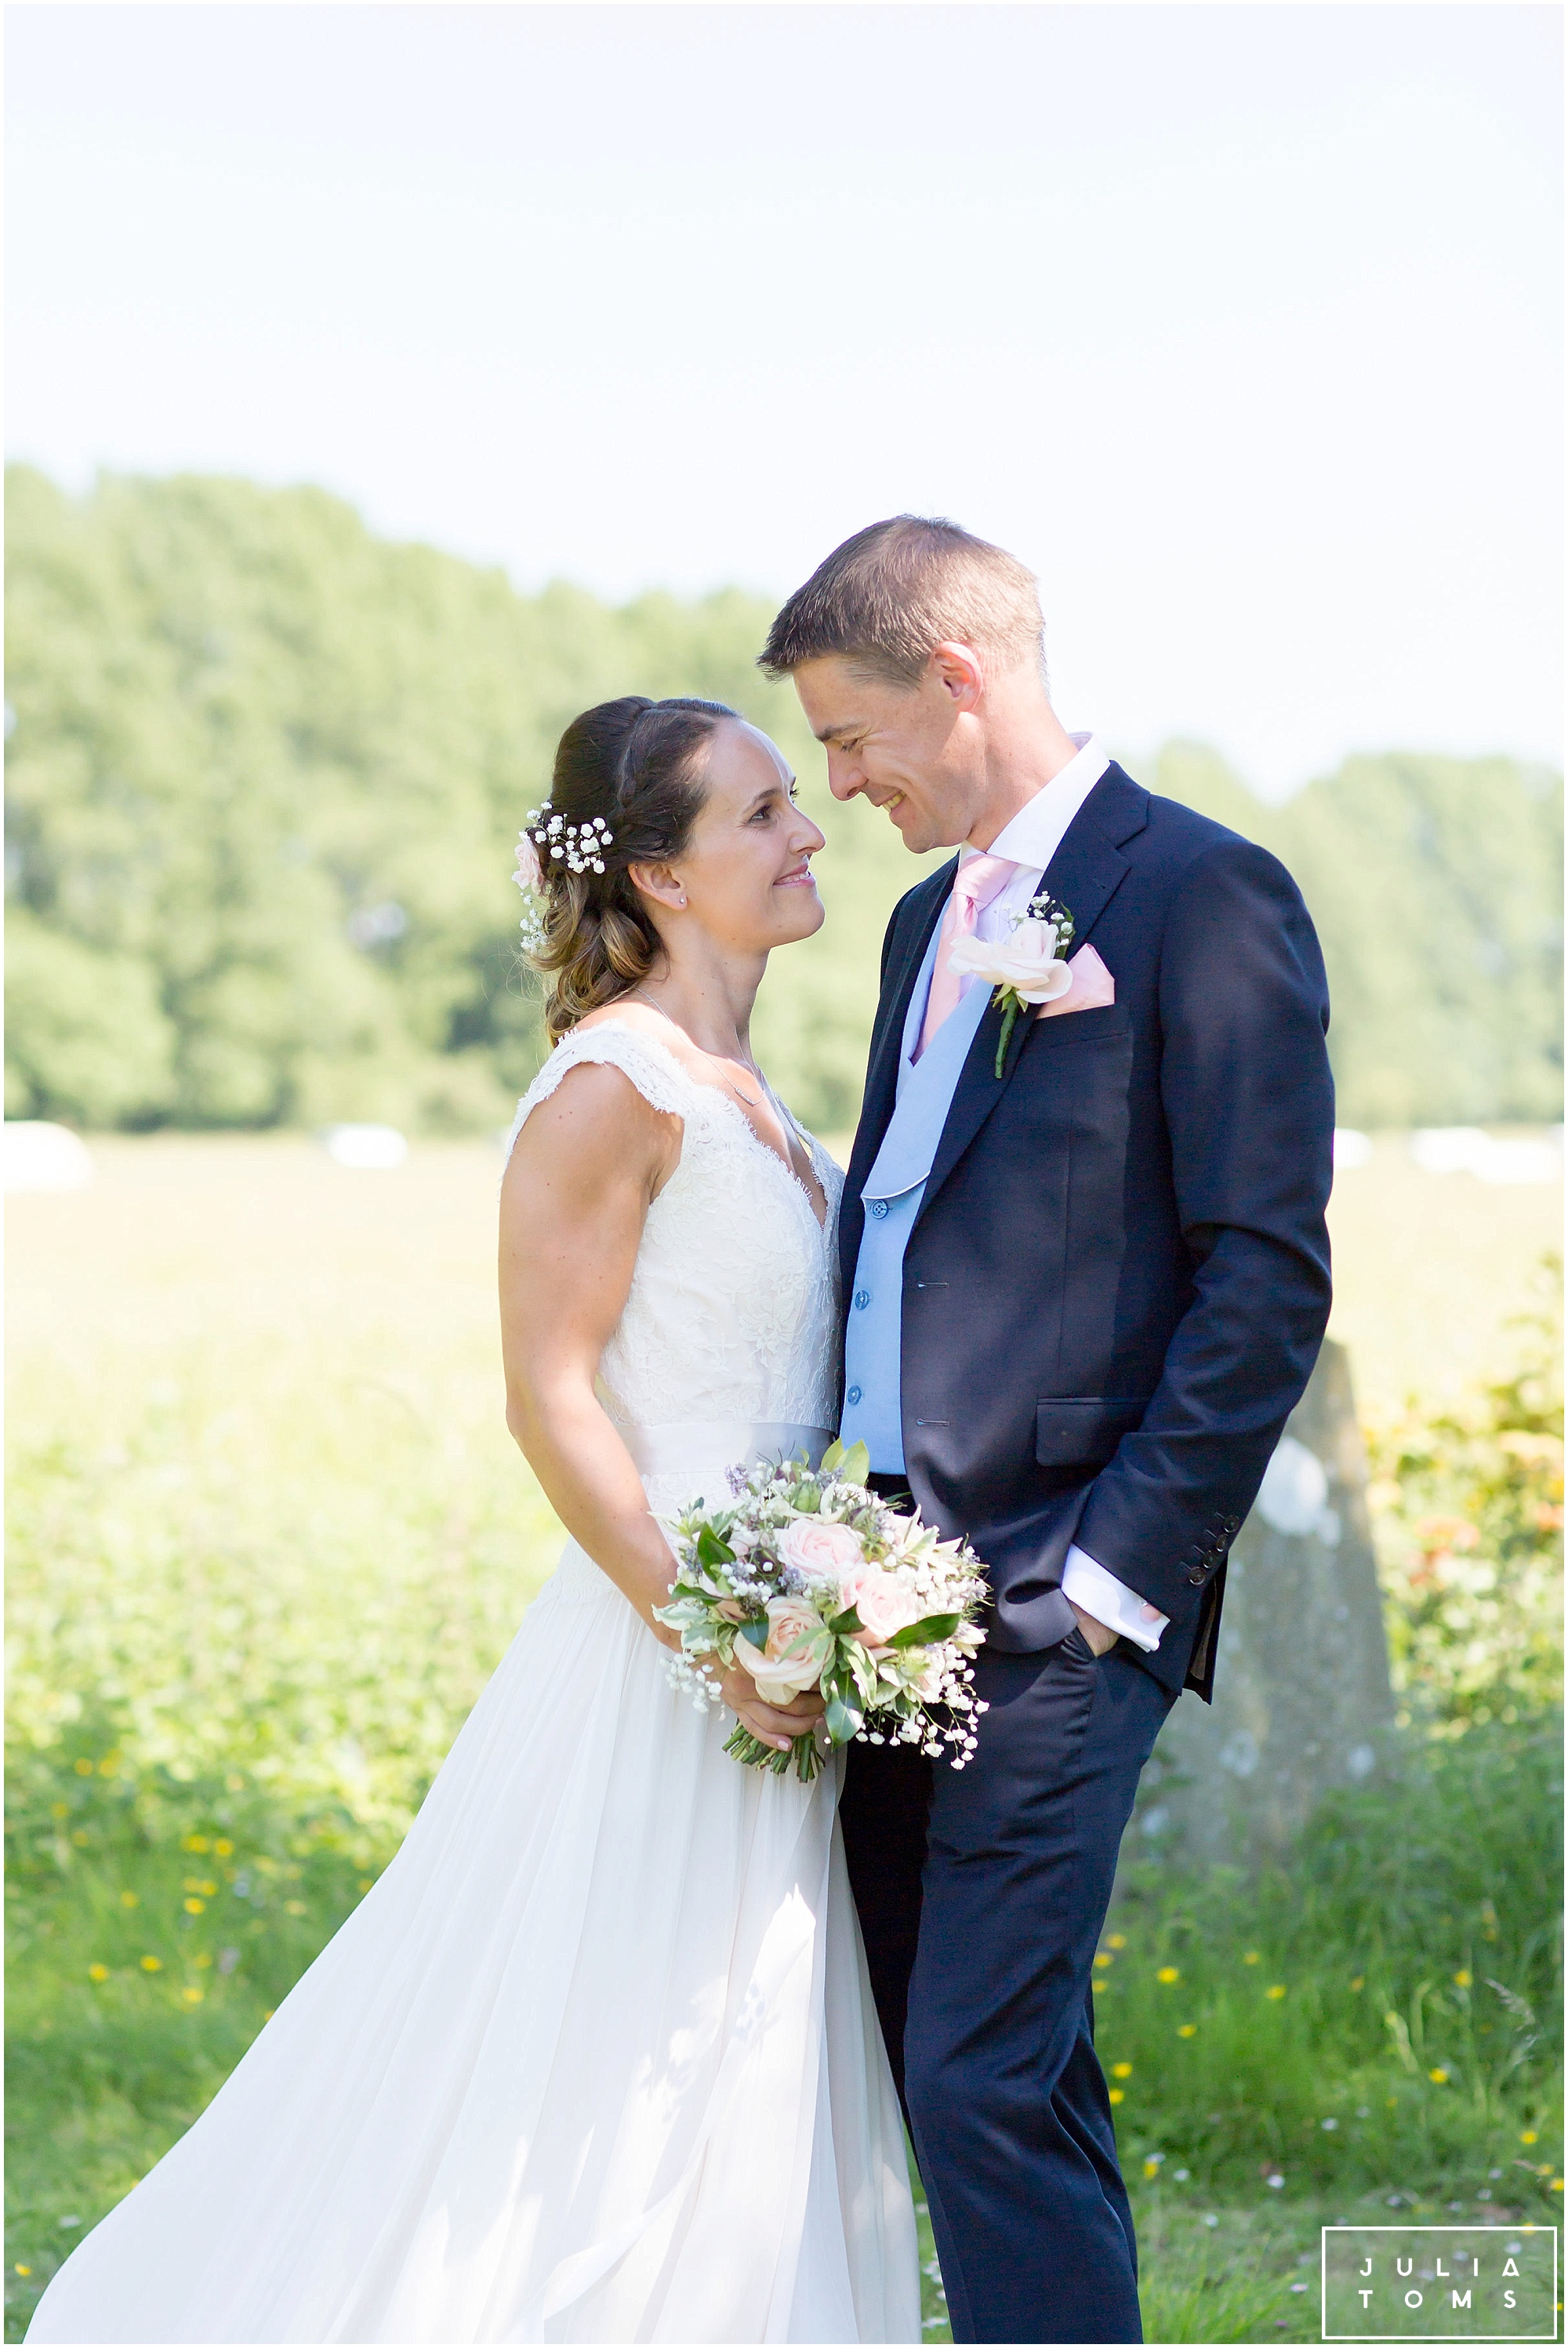 julia_toms_chichester_wedding_photographer_portsmouth_036.jpg